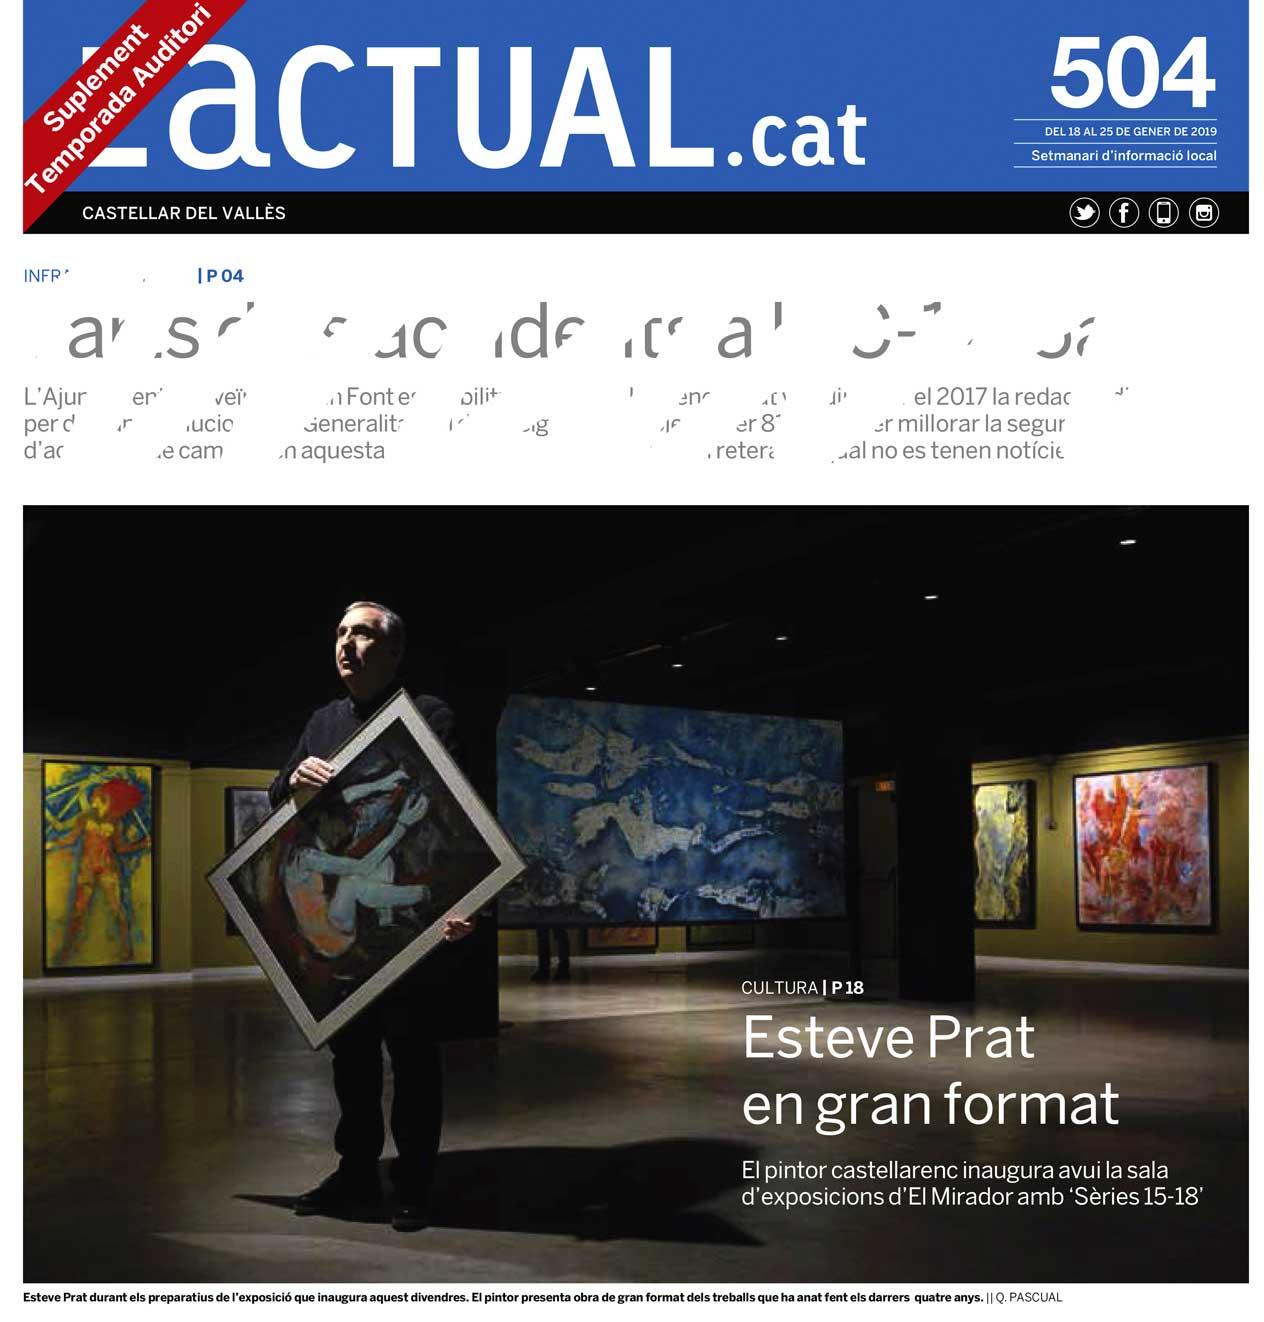 http://esteveprat.cat/wp-content/uploads/3-Portada-Actual-504-18-25-01-2019-5.jpg